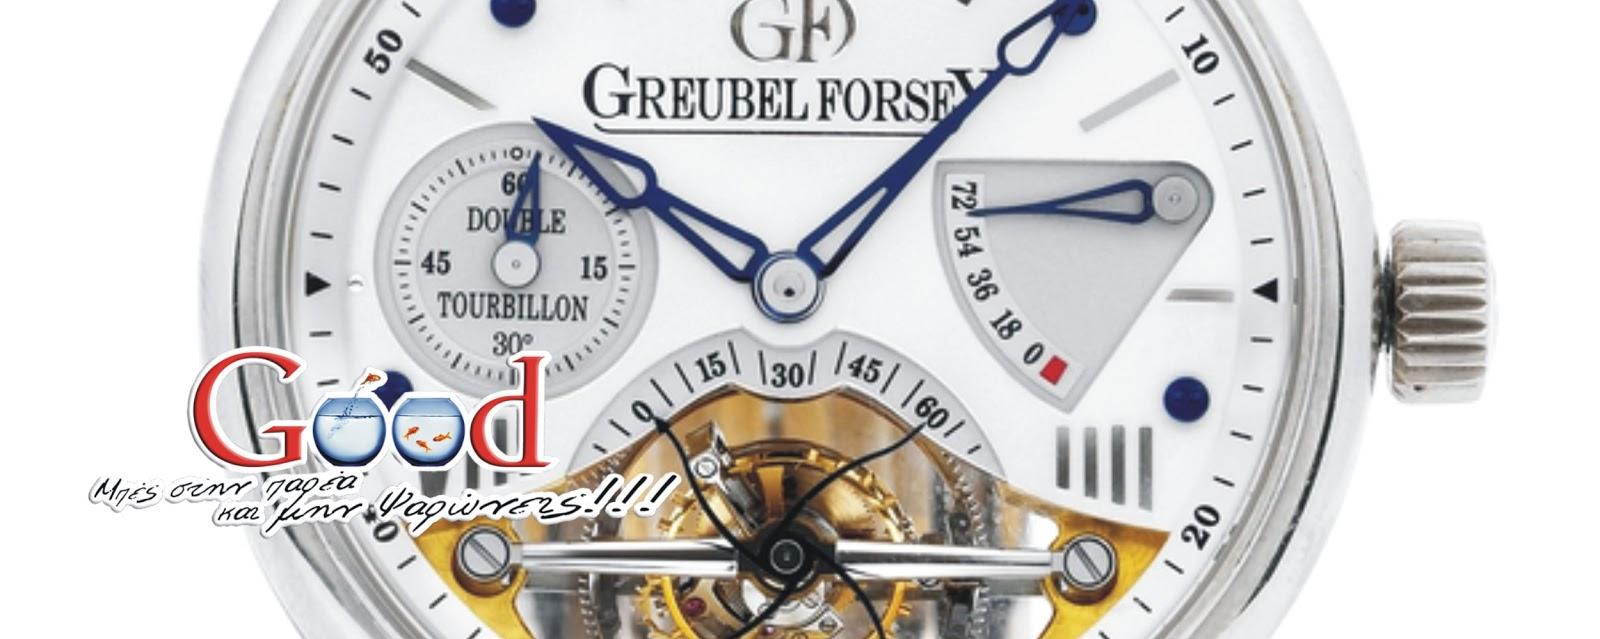 Goodkastoria  Πολυτελή ρολόγια για λίγους…! 3a842224600